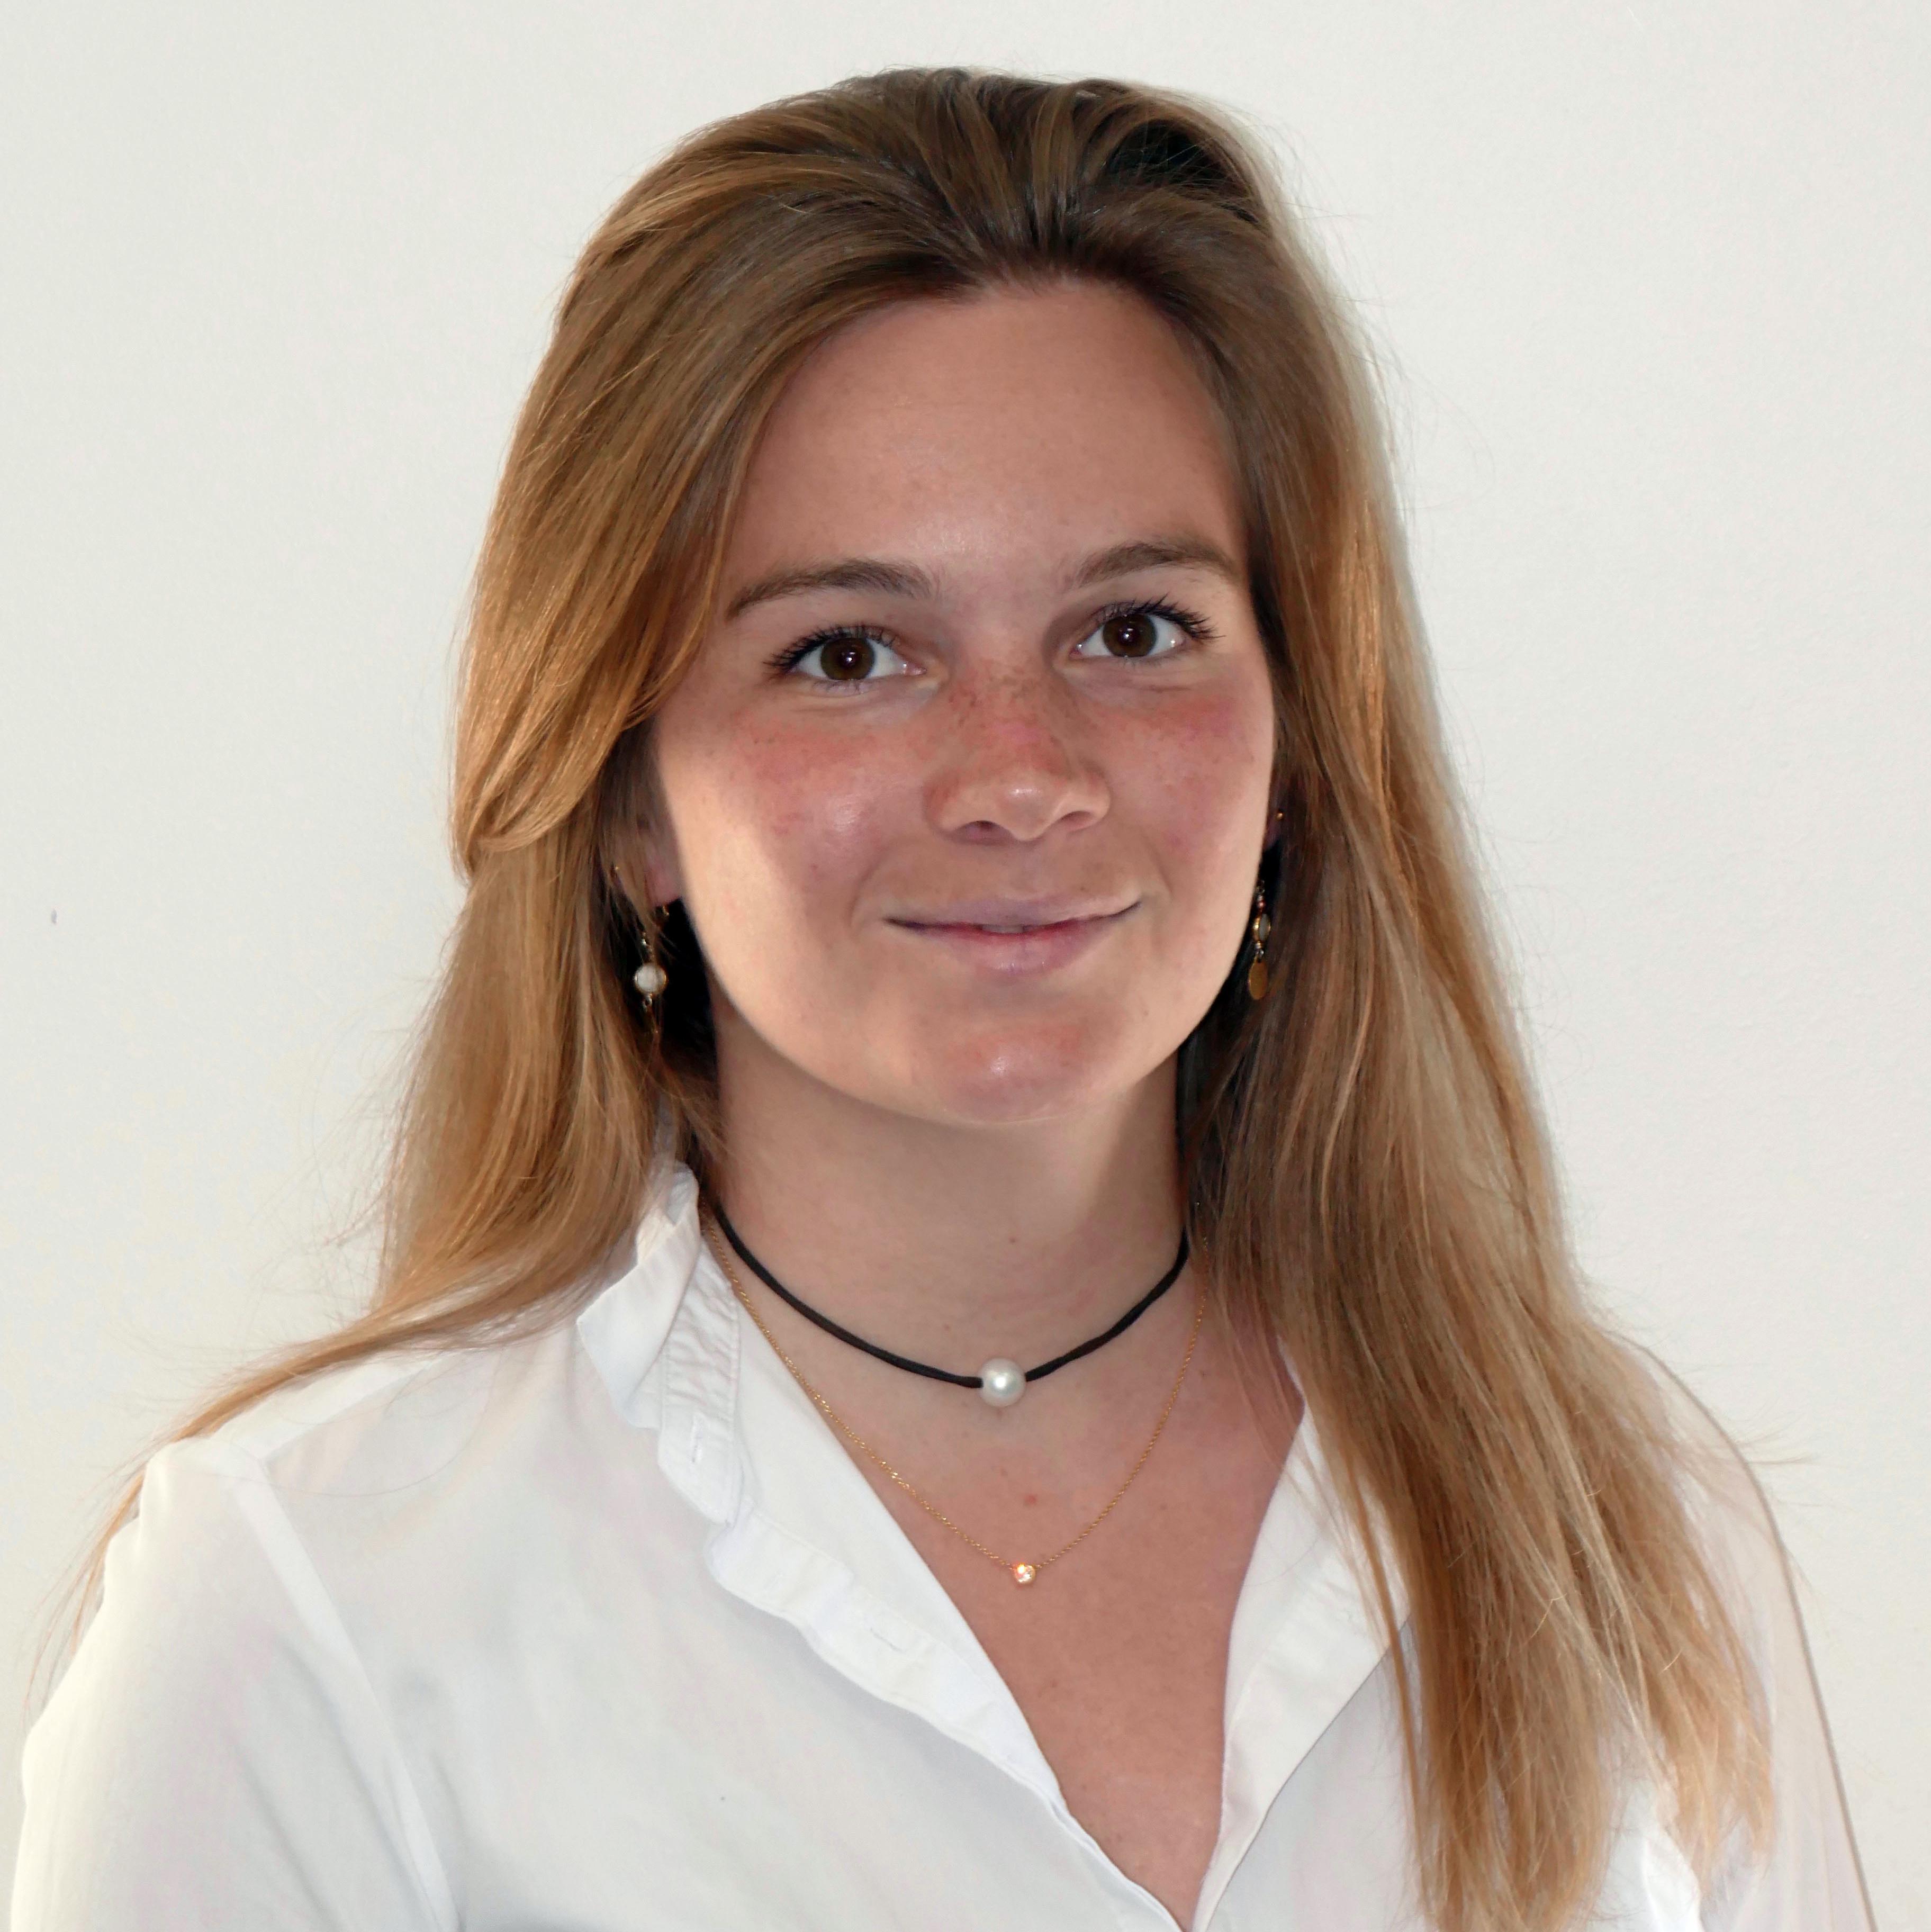 MARIE BOUZAT